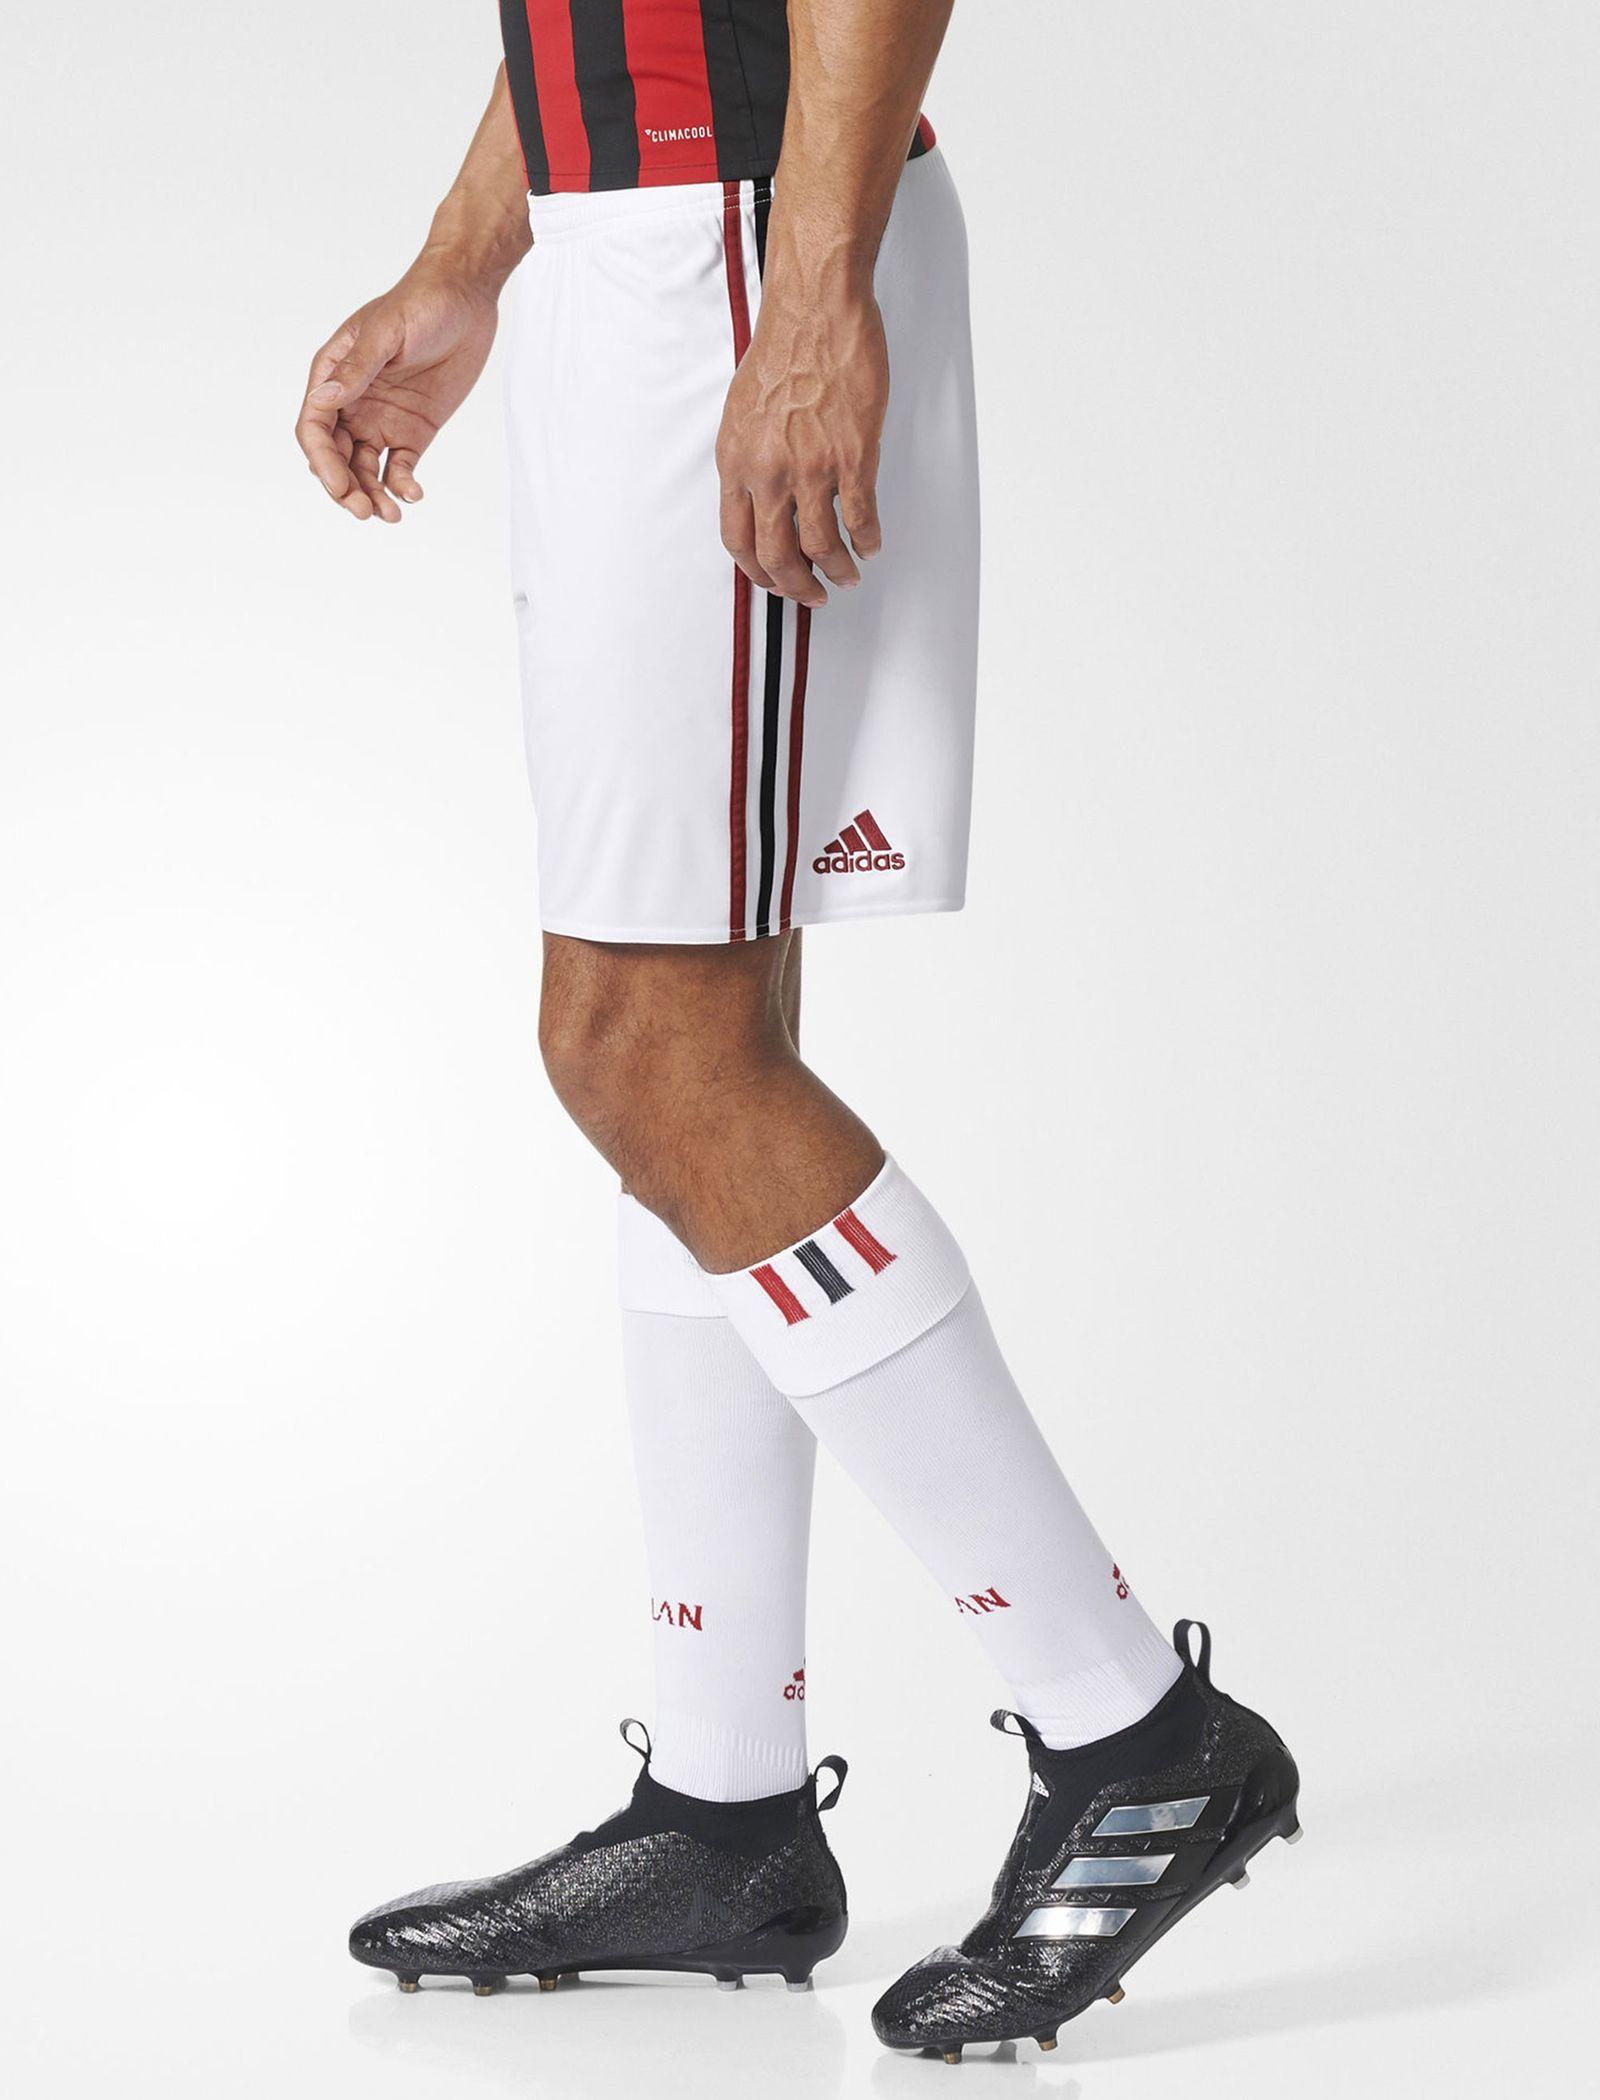 شلوارک فوتبال تیم  AC Milan Replica - آدیداس - سفيد   - 4